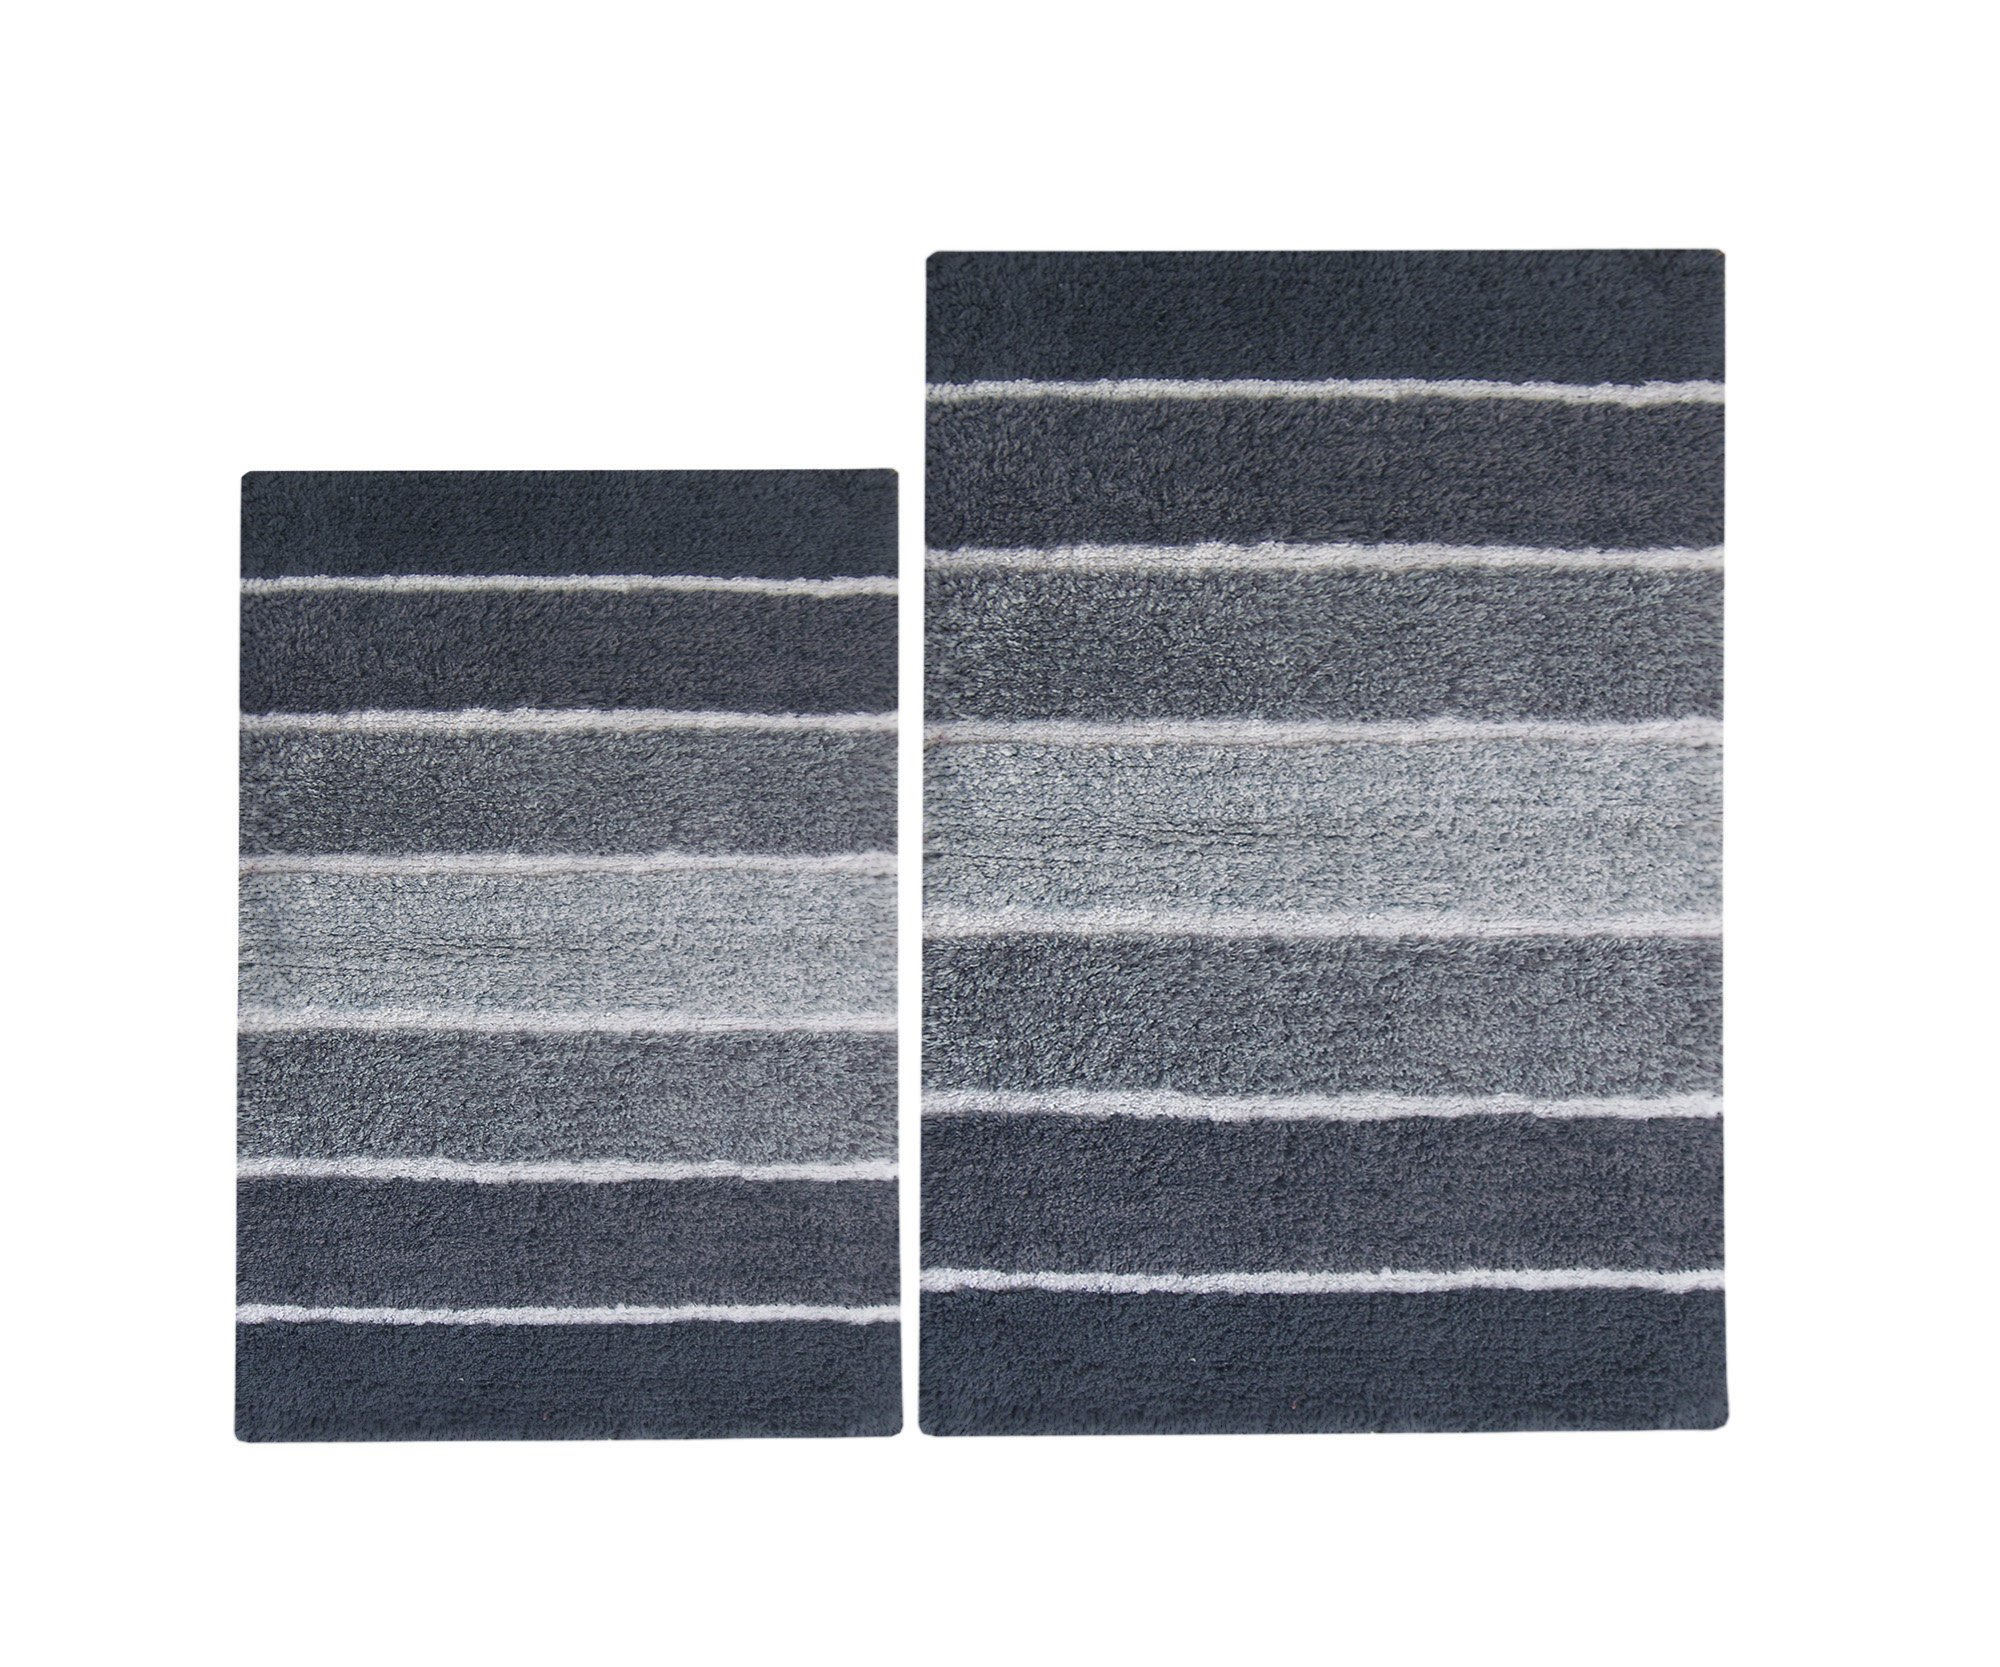 Chardin home 100% Pure Cotton - 2 Piece Cordural Stripe Bath Rug Set, (24''x40'' & 21''x34'') Gray-Charcoal with Latex spray non-skid backing